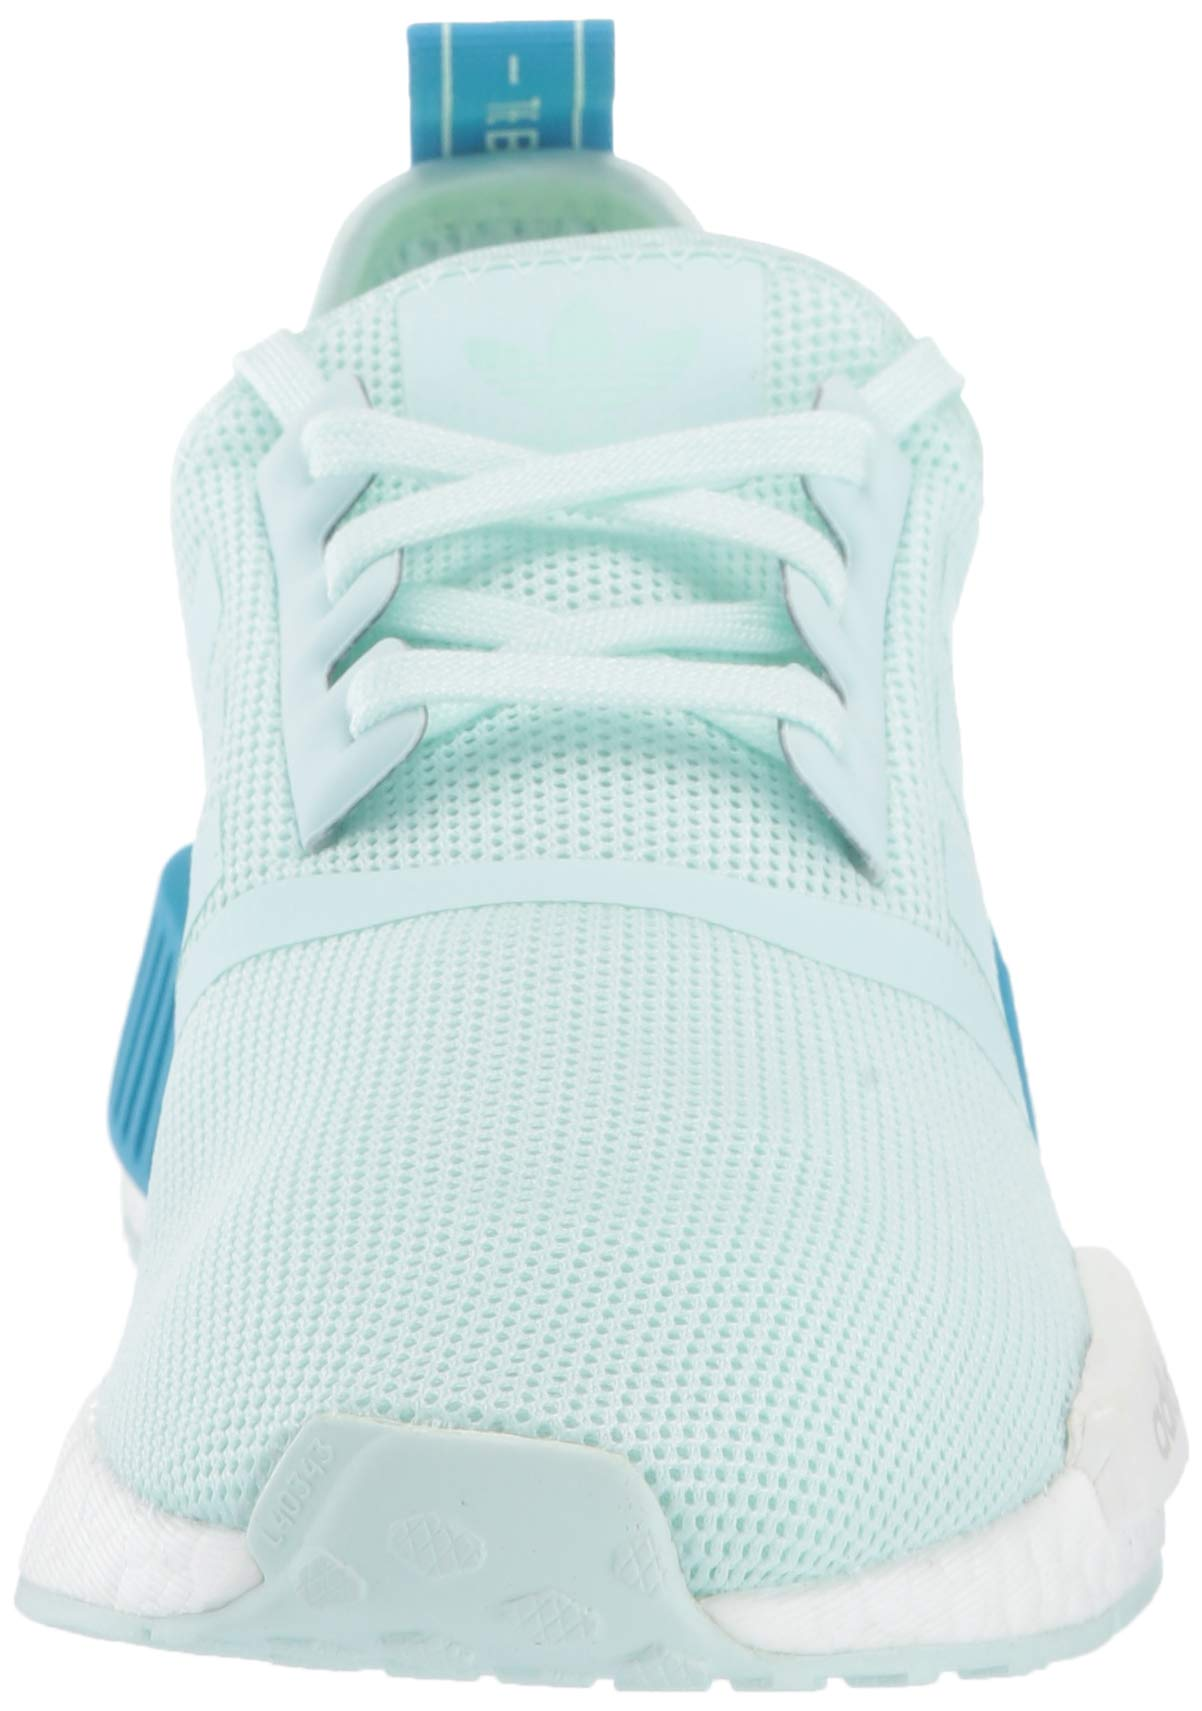 adidas Originals Unisex NMD_R1 Running Shoe, ice Mint/Shock Cyan, 3.5 M US Big Kid by adidas Originals (Image #4)